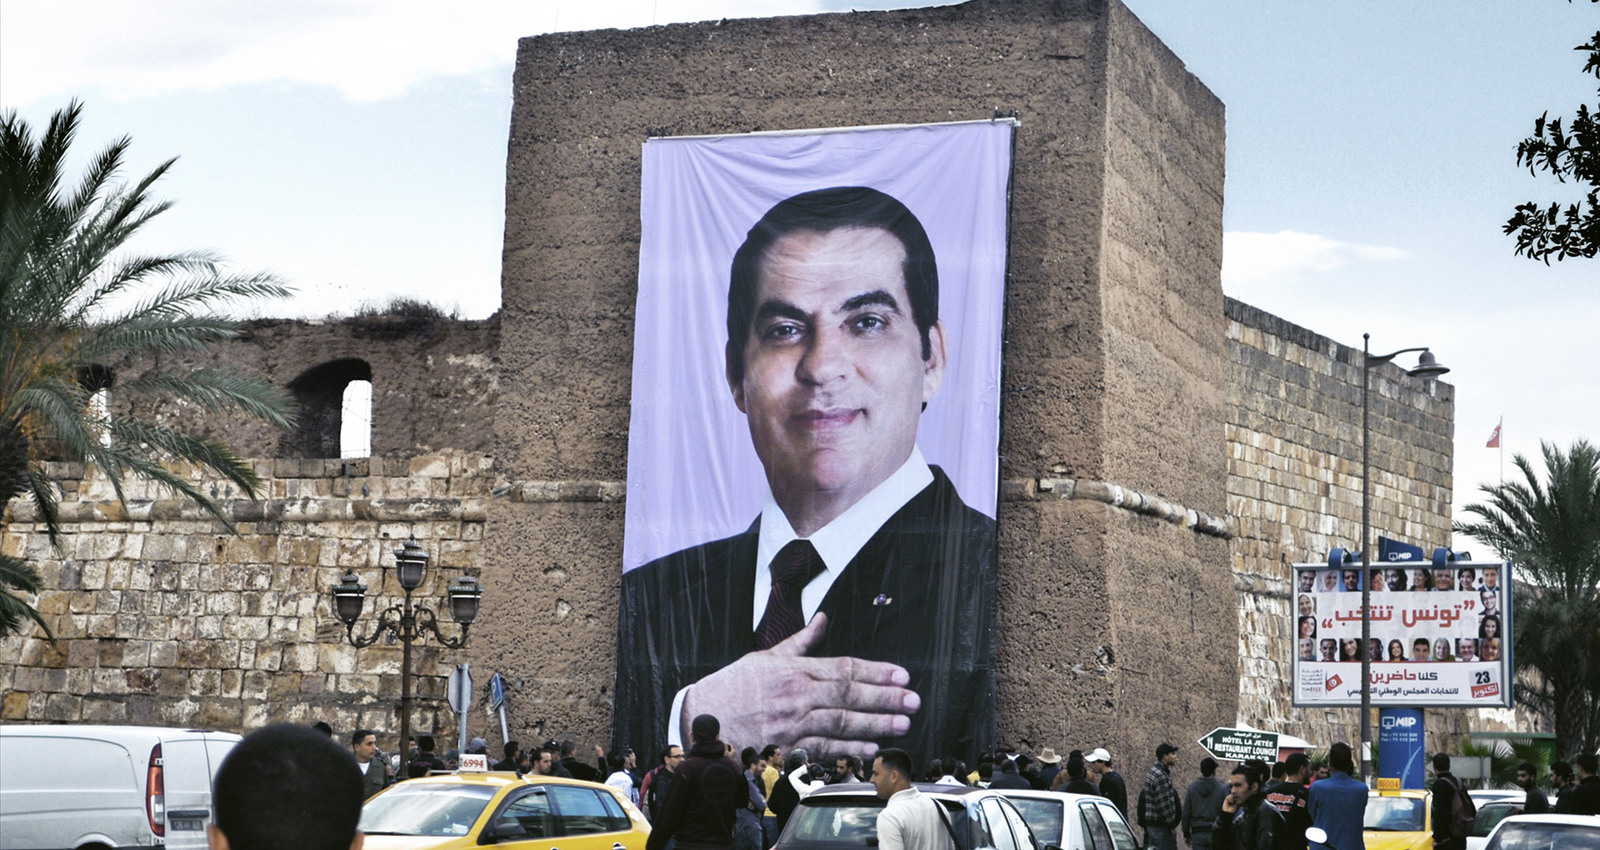 The Return of Dictator Ben Ali